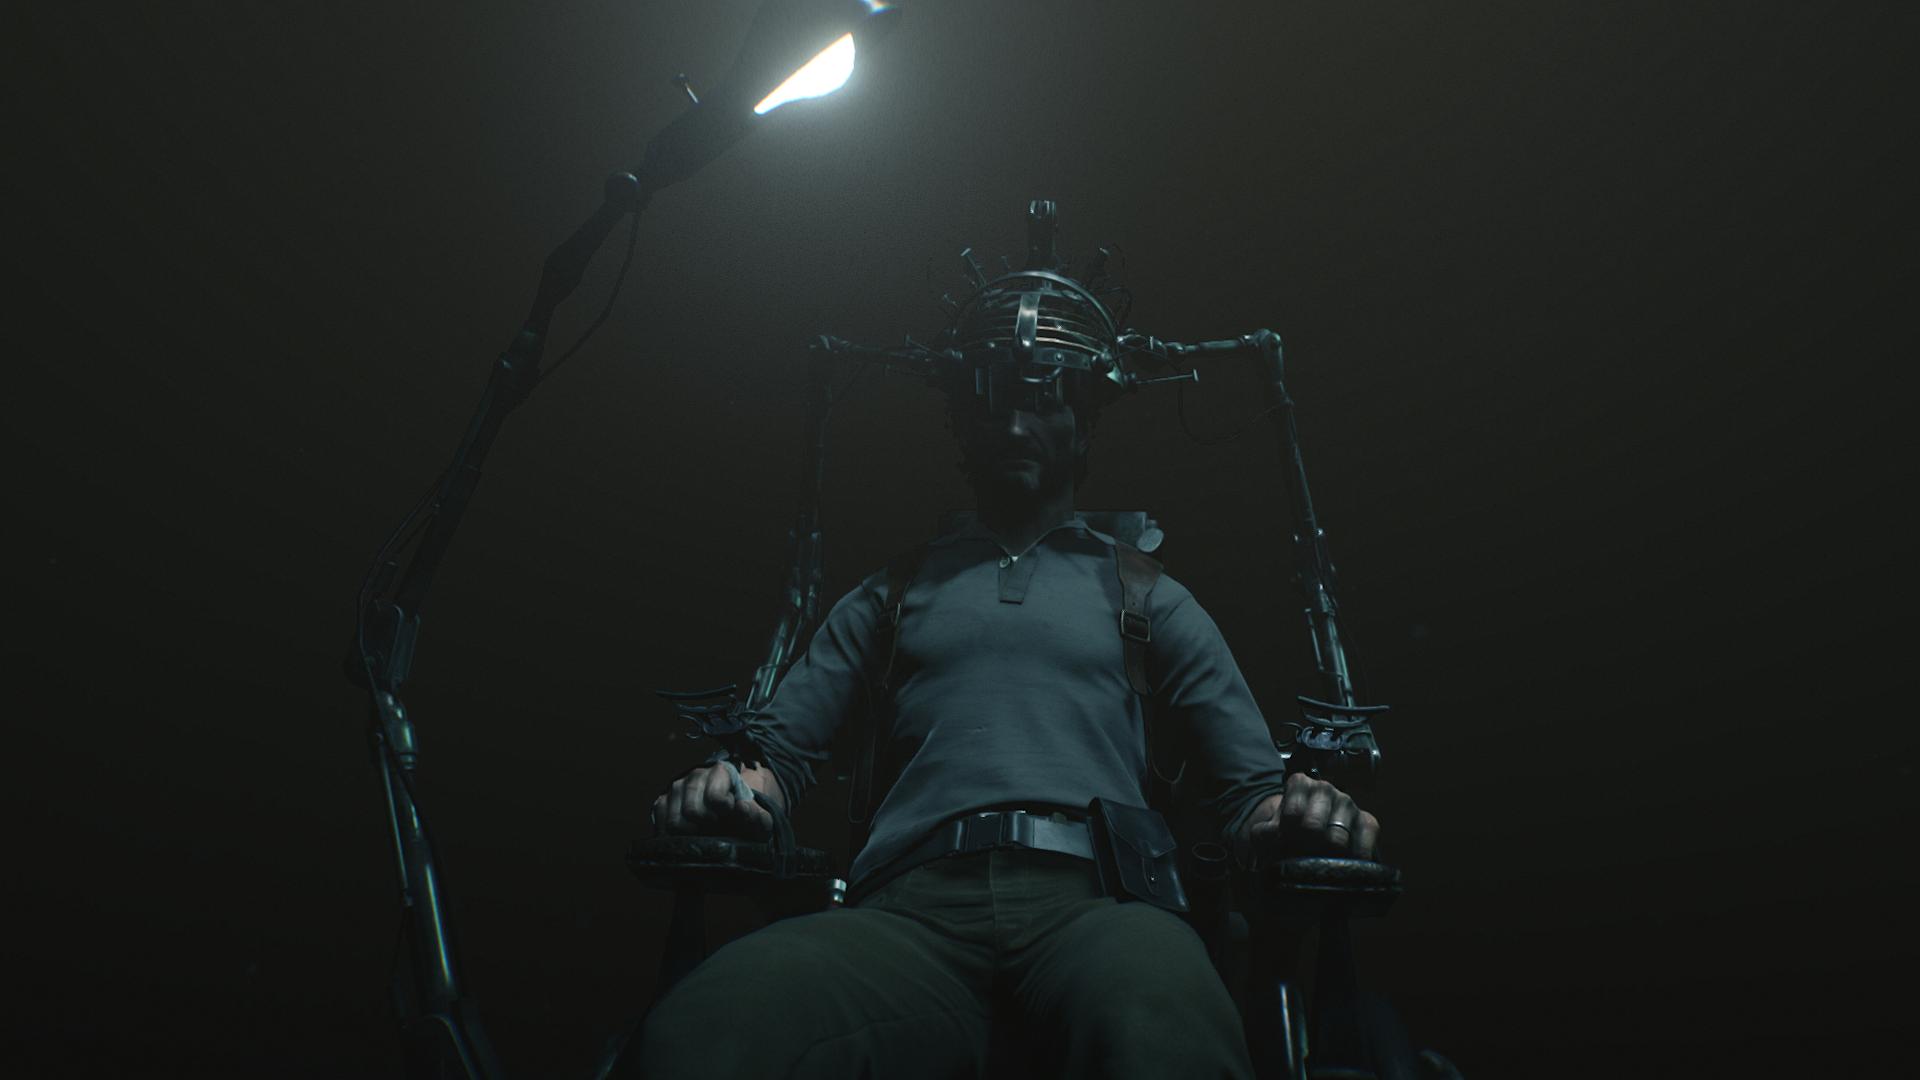 Wallpaper Horror Video Games Bethesda Softworks The Evil